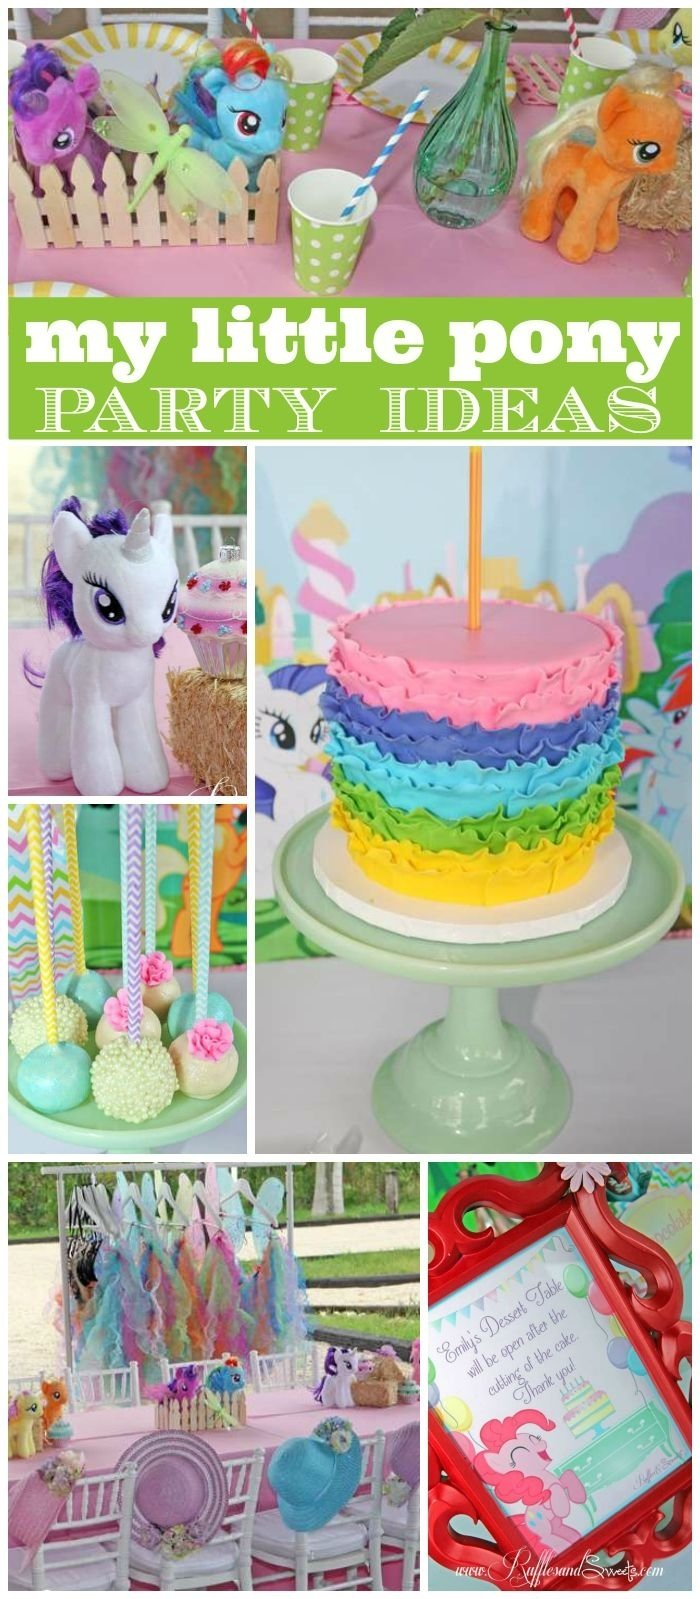 10 Stylish My Little Pony Friendship Is Magic Birthday Party Ideas my little pony friendship is magic birthday emilys my little 2020